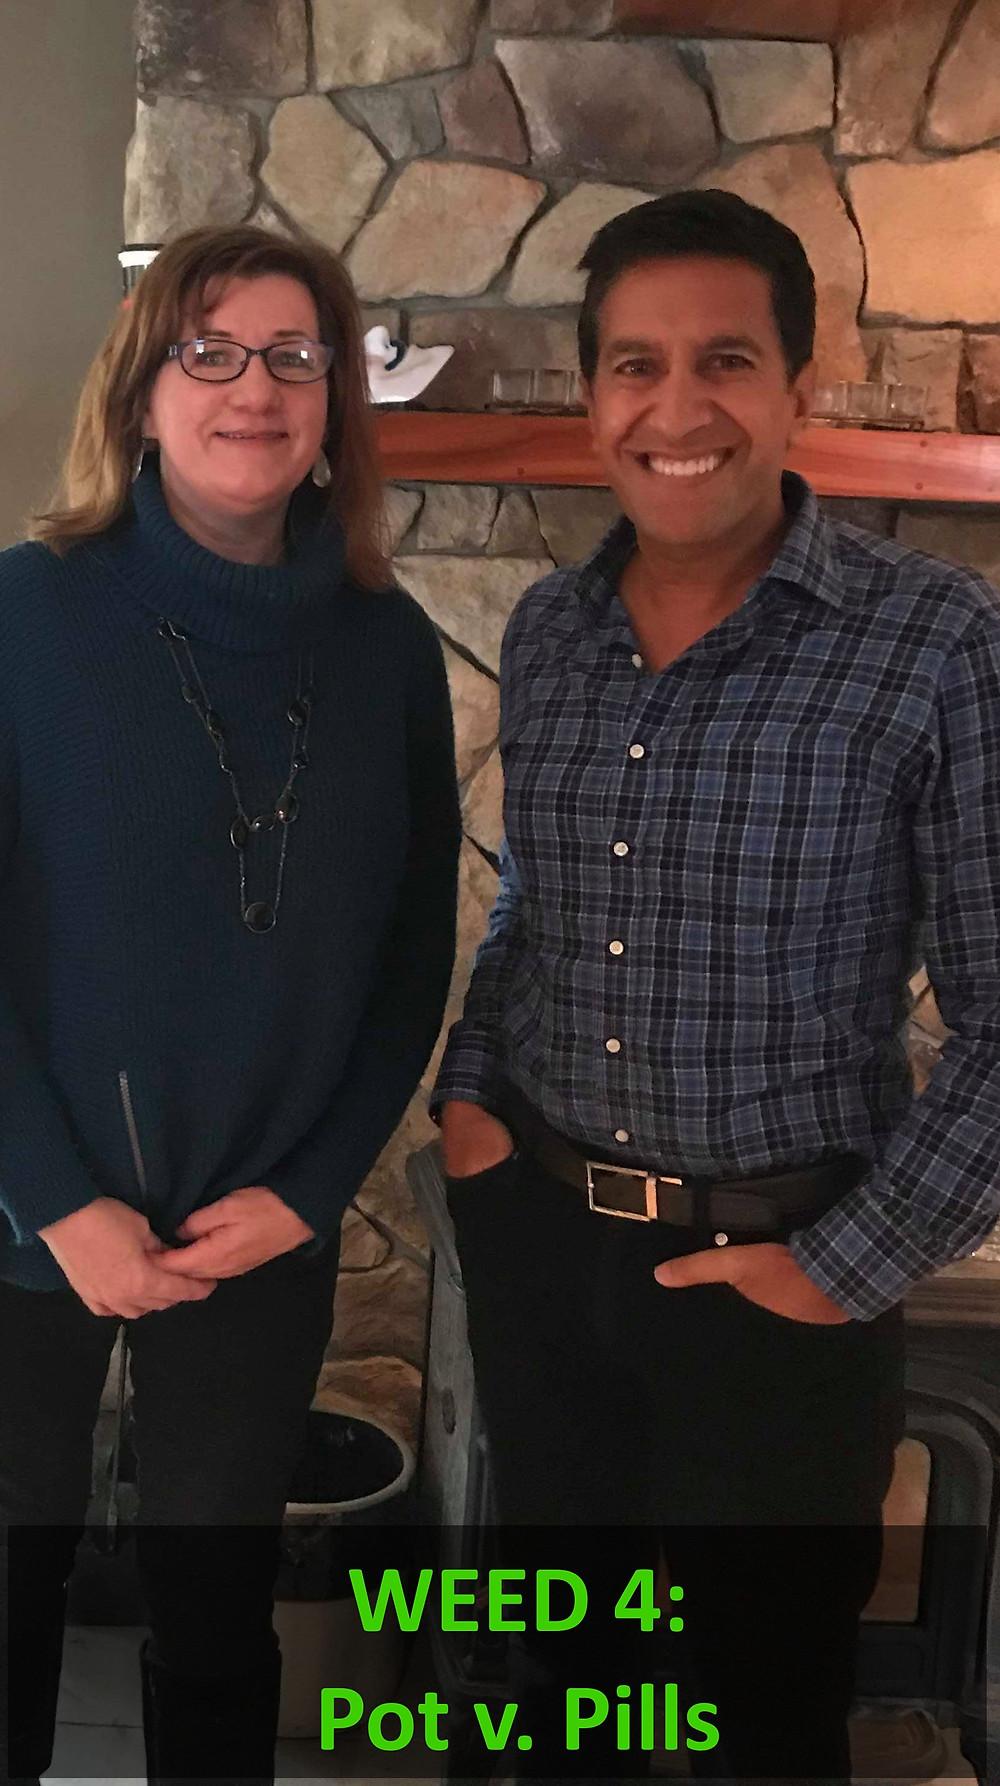 Roxanne Gullikson and Dr. Sanjay Gupta Weed 4: Pot v. Pills on CNN